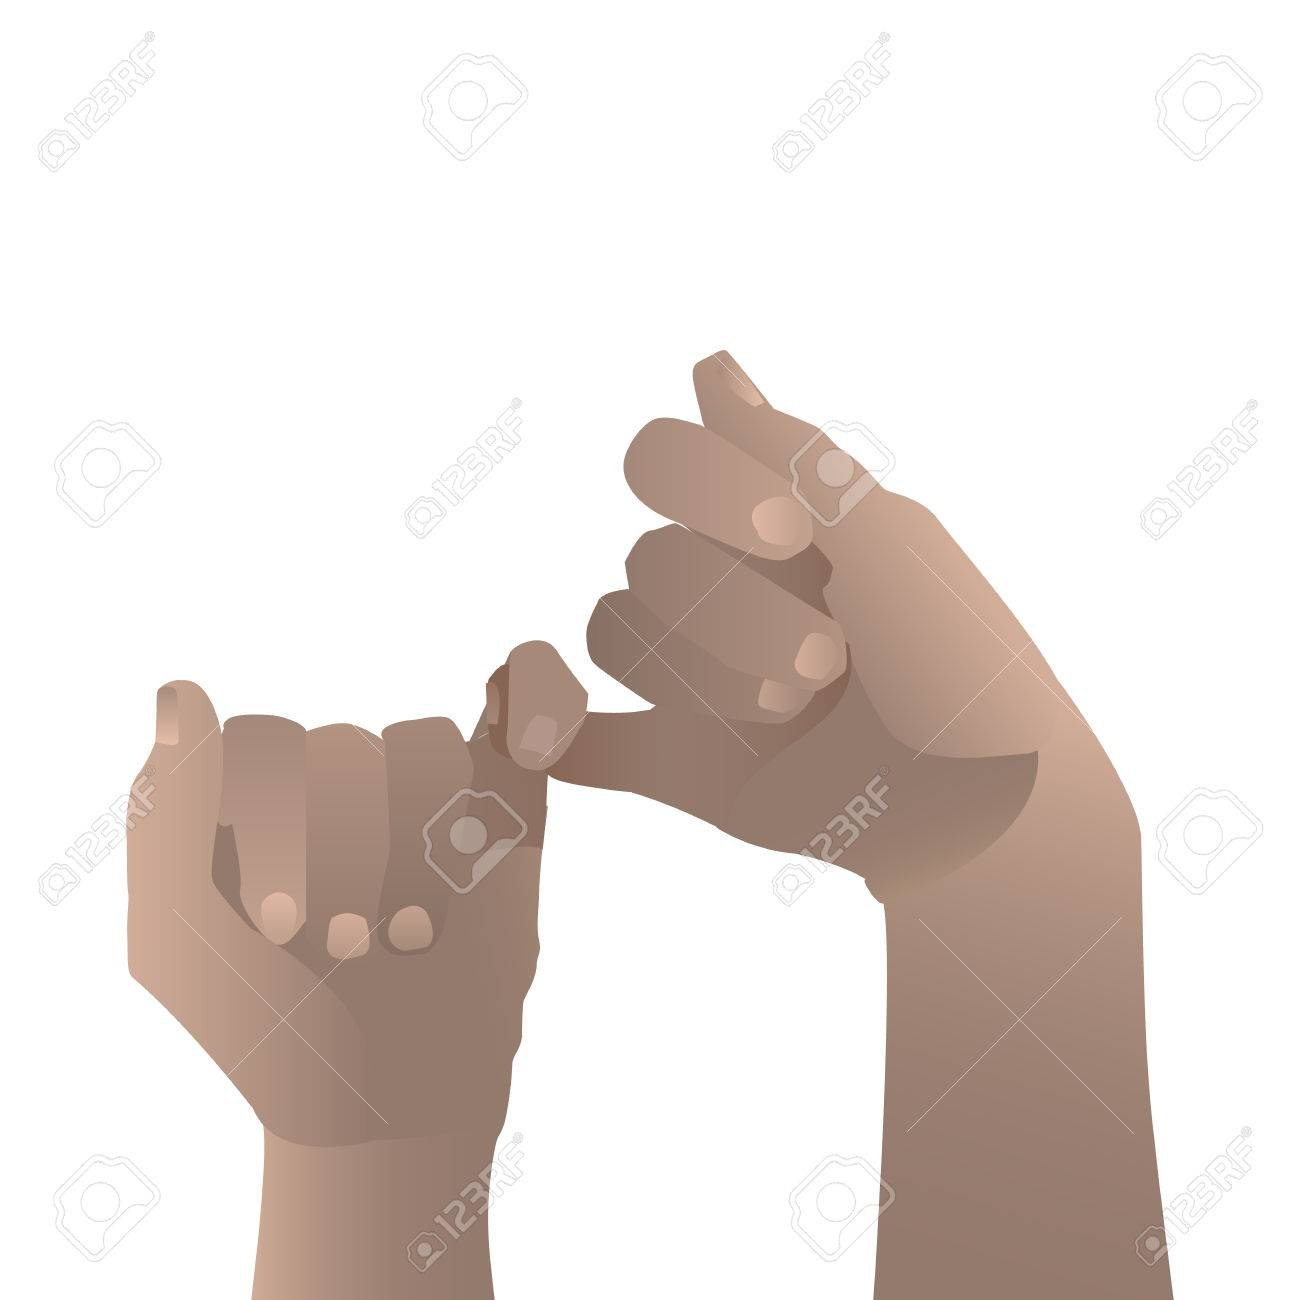 Hand To Hand Reconciliation Childish White Background 1300x1300